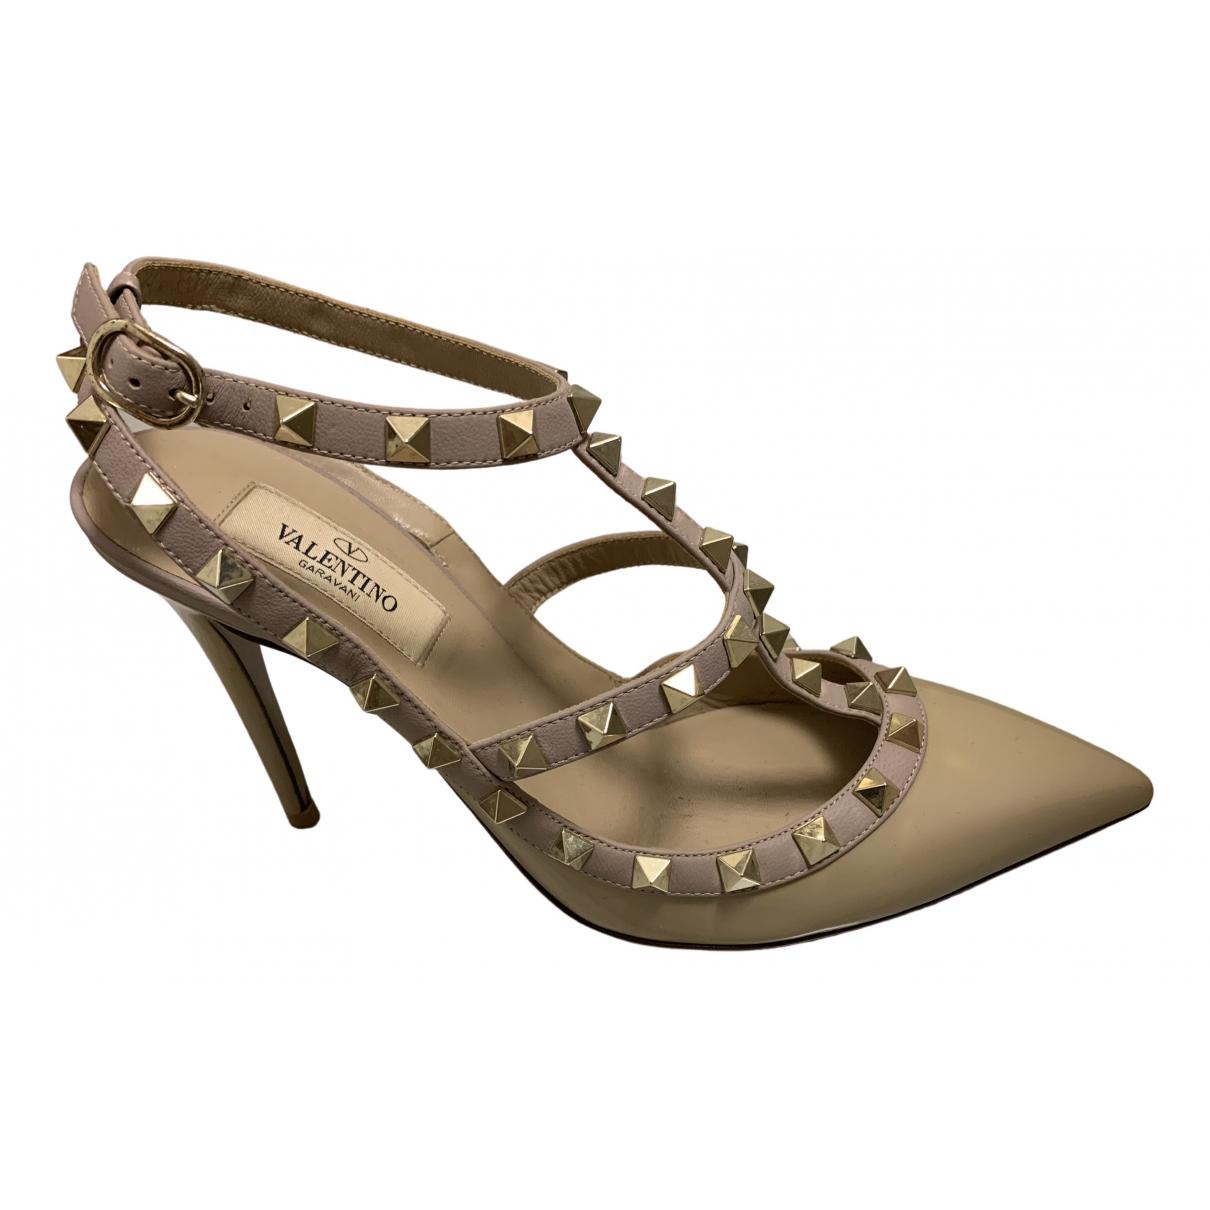 Valentino Garavani Rockstud Beige Patent leather Heels for Women 38 EU